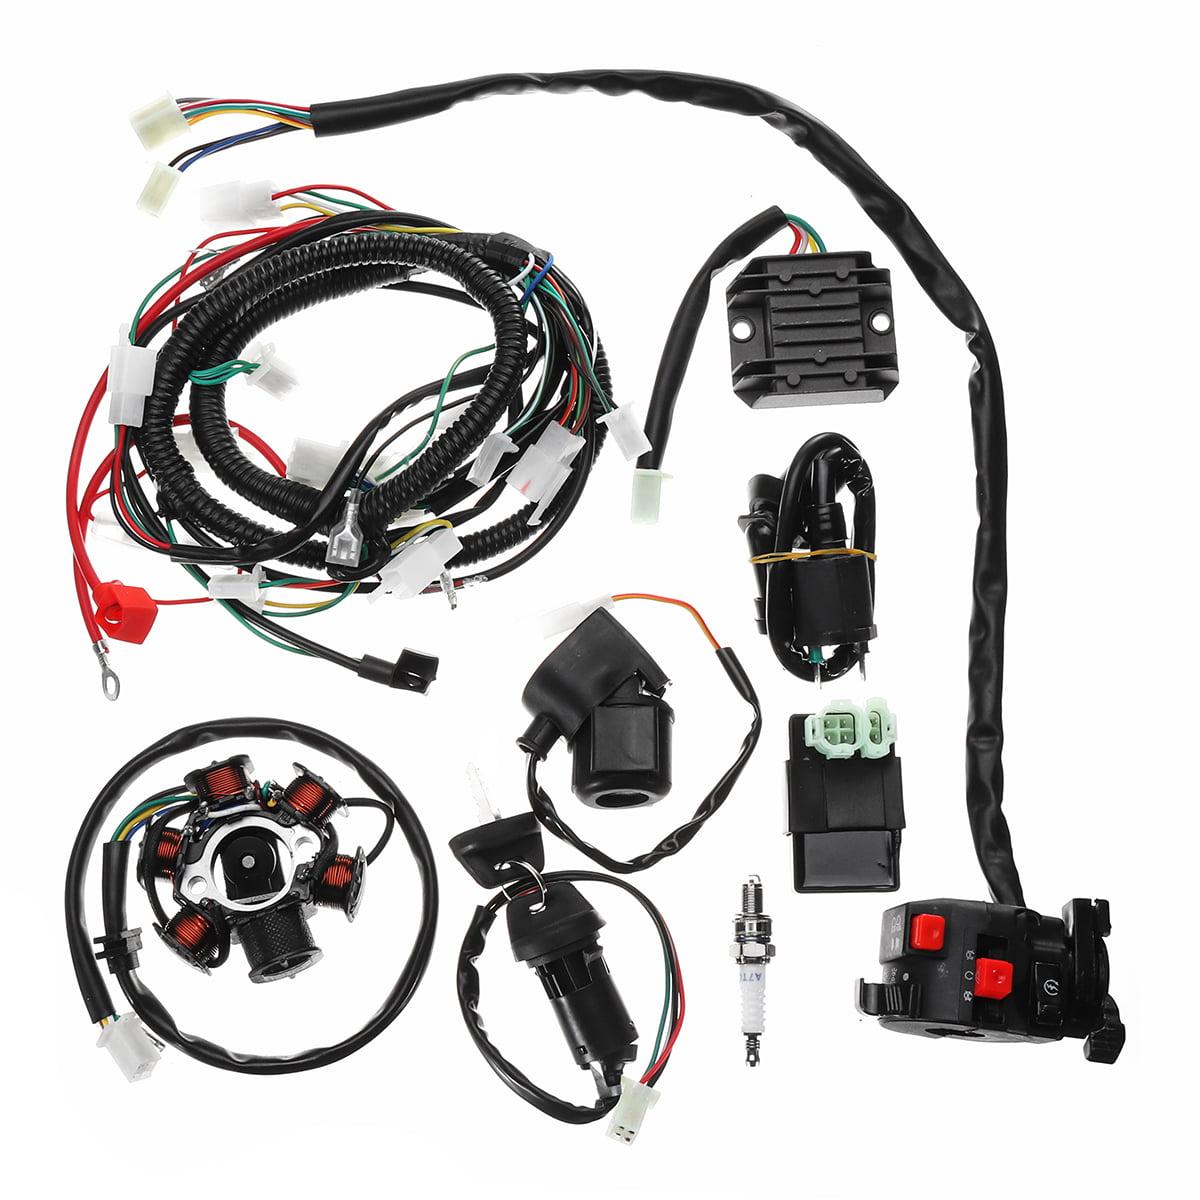 [WQZT_9871]  Full Electrics Wiring Harness Kit Loom CDI Coil For GY6 150CC ATV Quad Go  Kart Buggy - Walmart.com - Walmart.com | 150cc Atv Wiring |  | Walmart